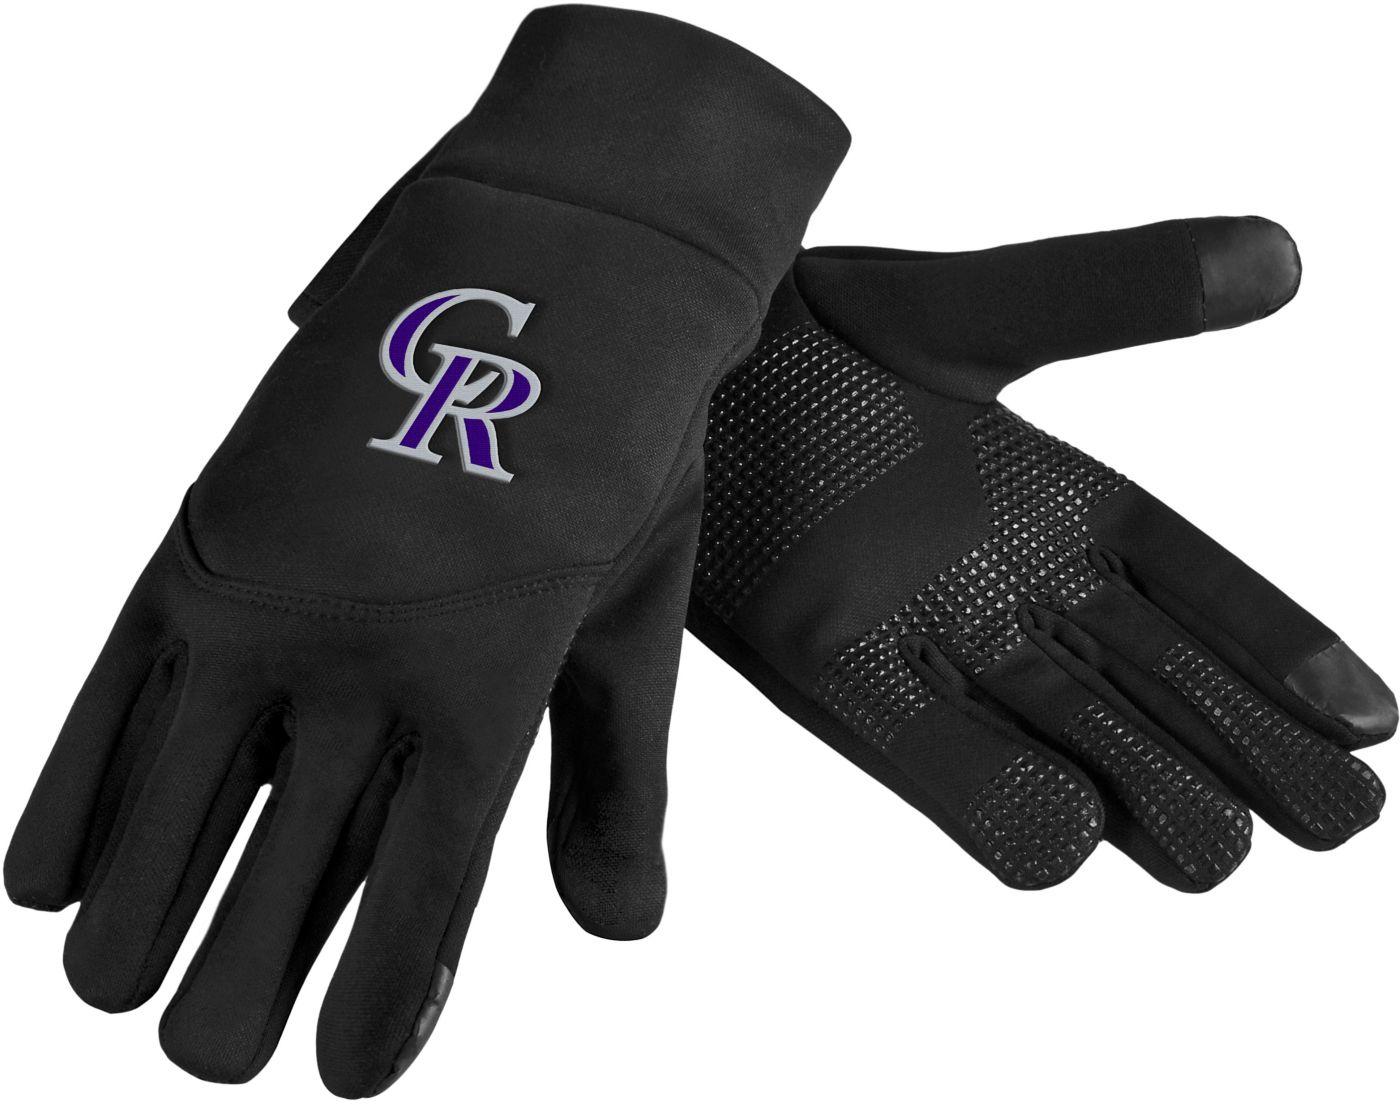 FOCO Colorado Rockies Neoprene Texting Gloves